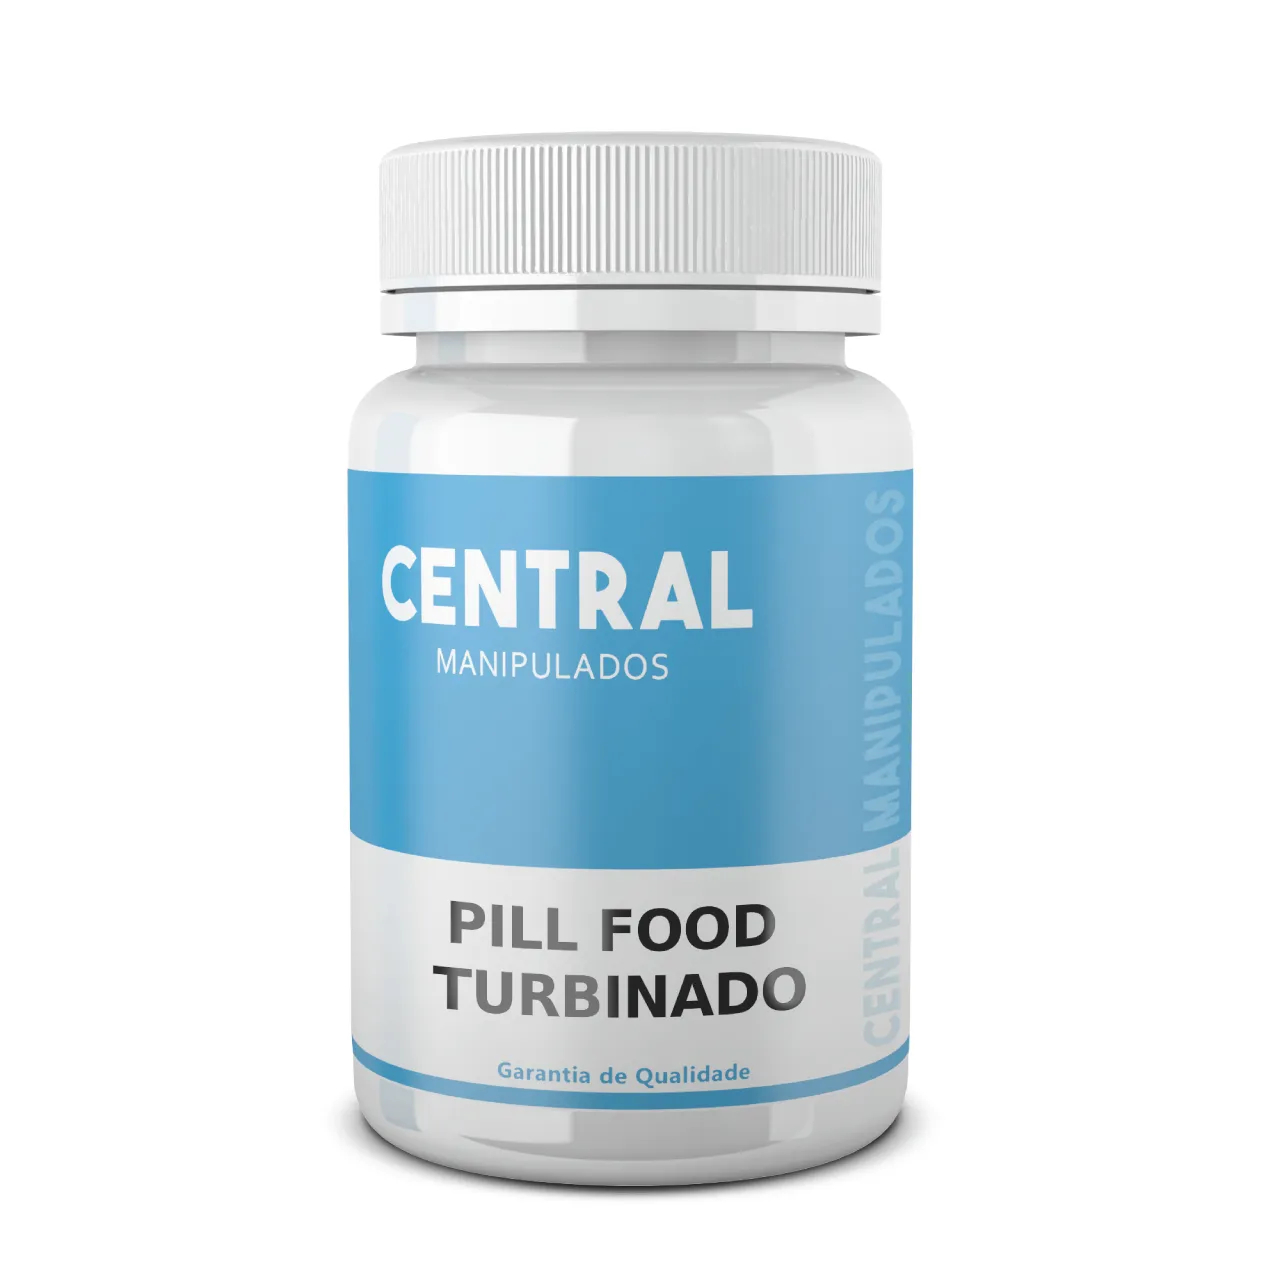 Central Pill Food Turbinado - 30 cápsulas - complexo vitamínico Central Manipulados